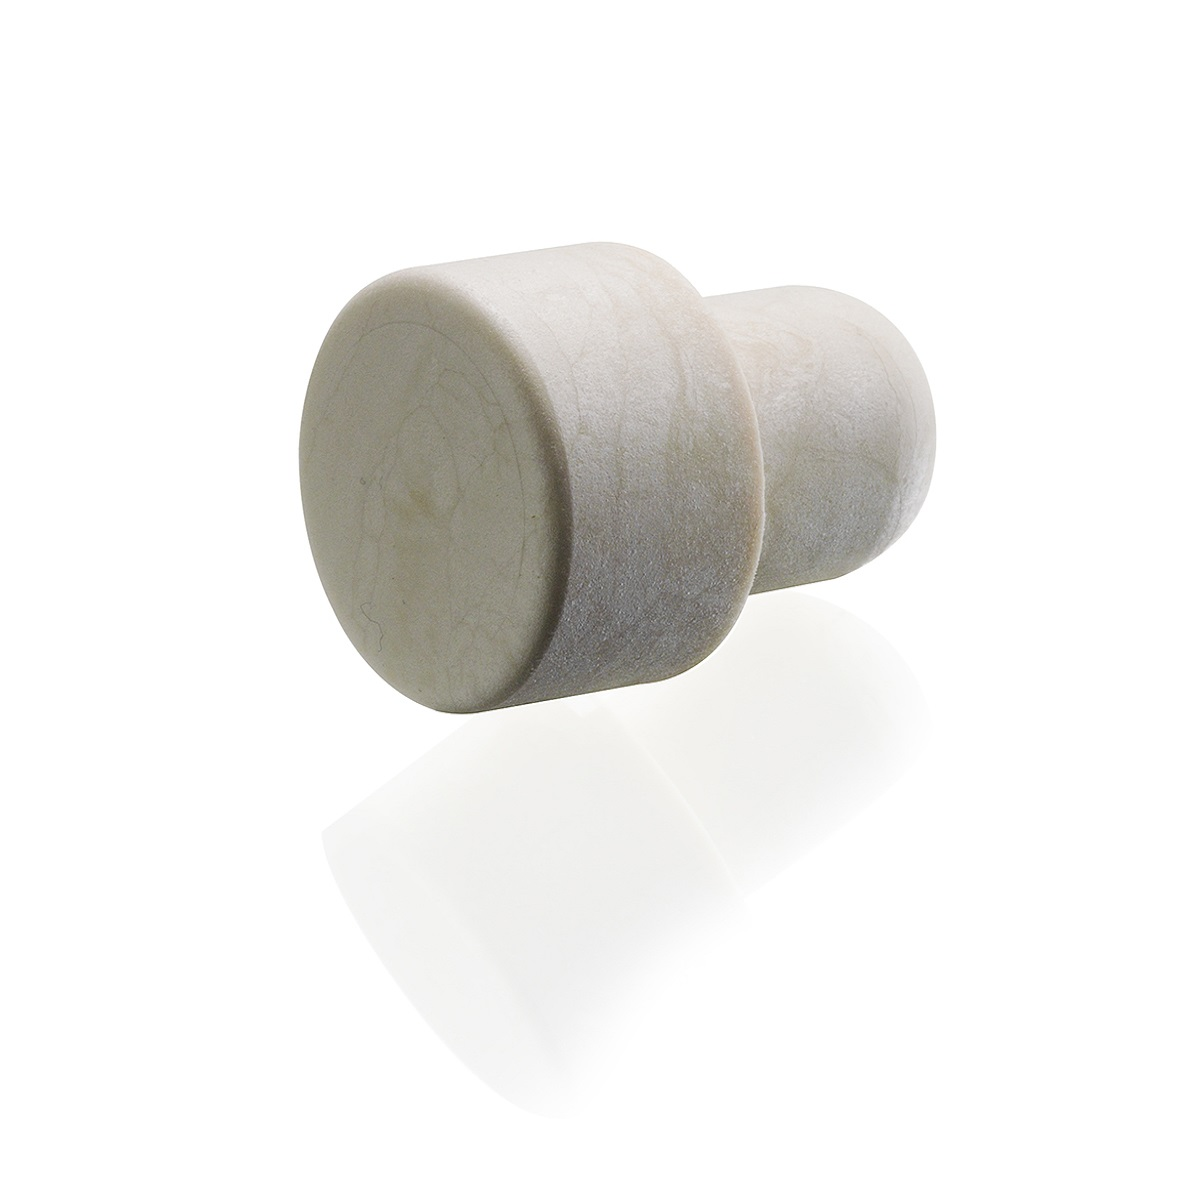 thetis pack πώμα συνθετικό ξύλινη κεφαλή φελλός synthetic cap καπάκια